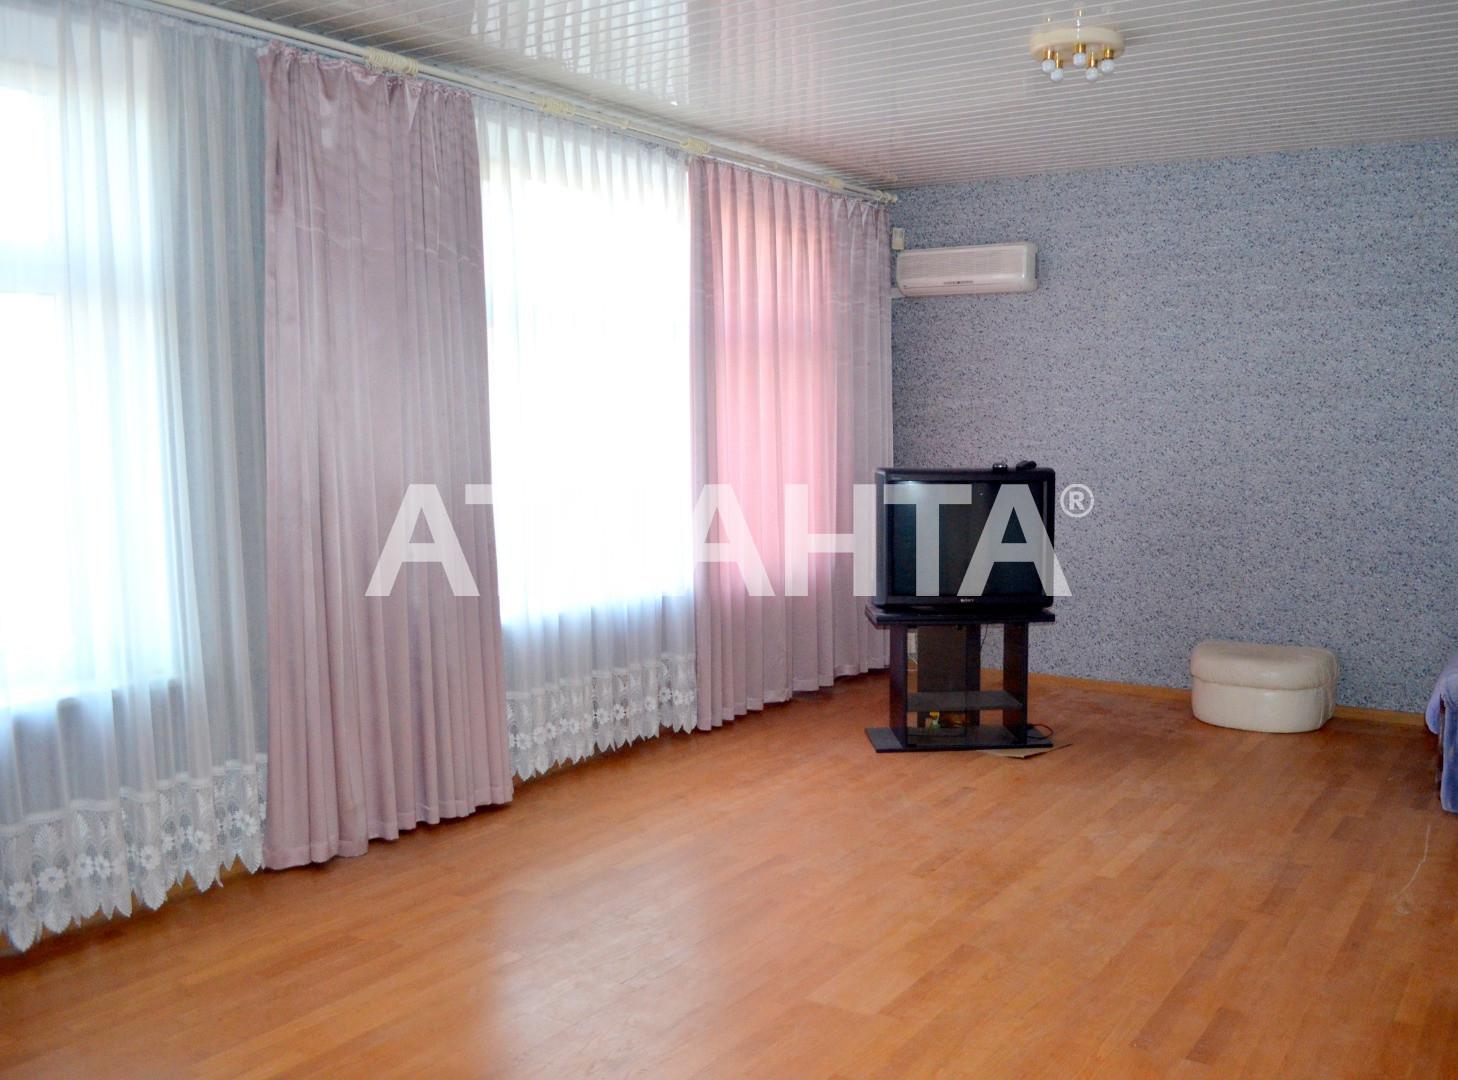 Продается 3-комнатная Квартира на ул. Французский Бул. (Пролетарский Бул.) — 98 000 у.е. (фото №7)